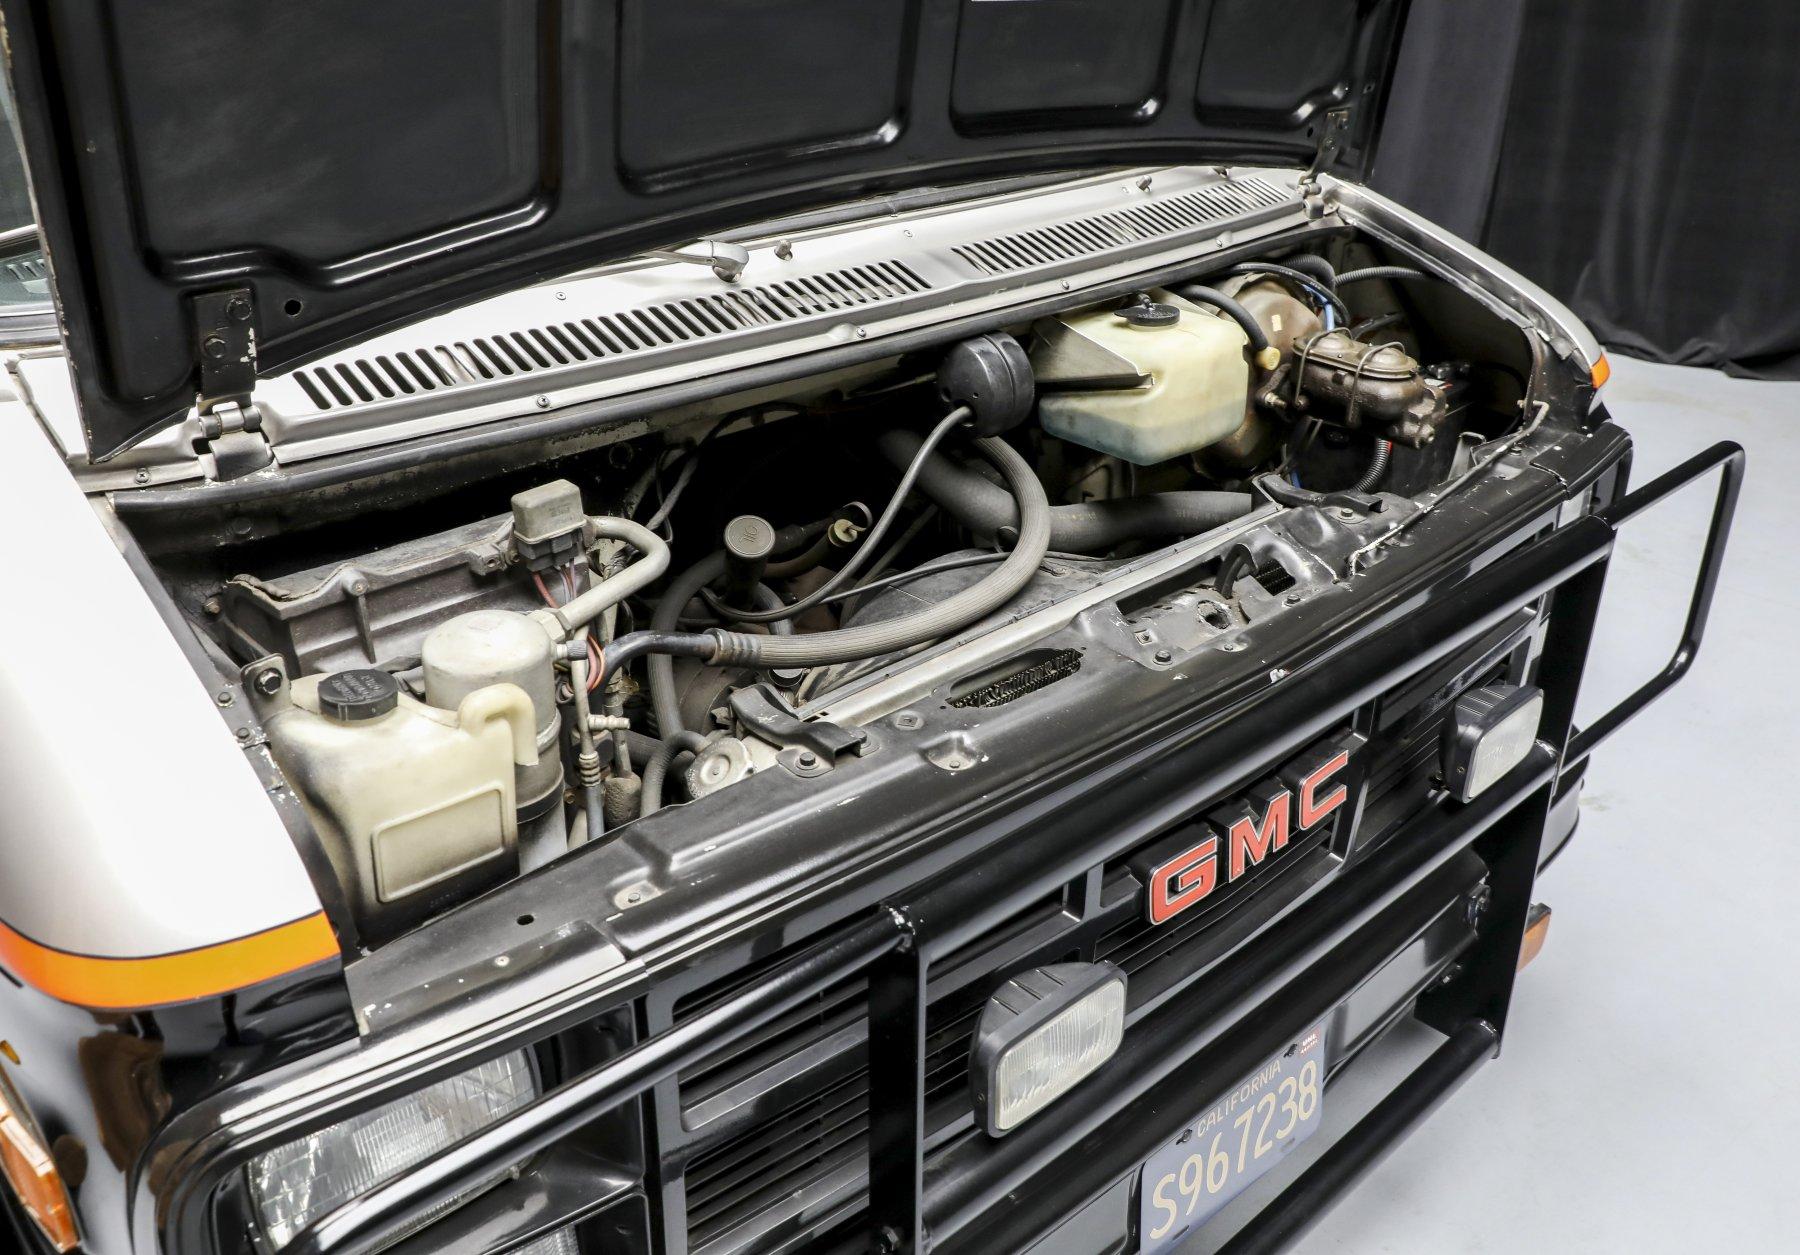 A-Team GMC G-Series 83 Van engine bay